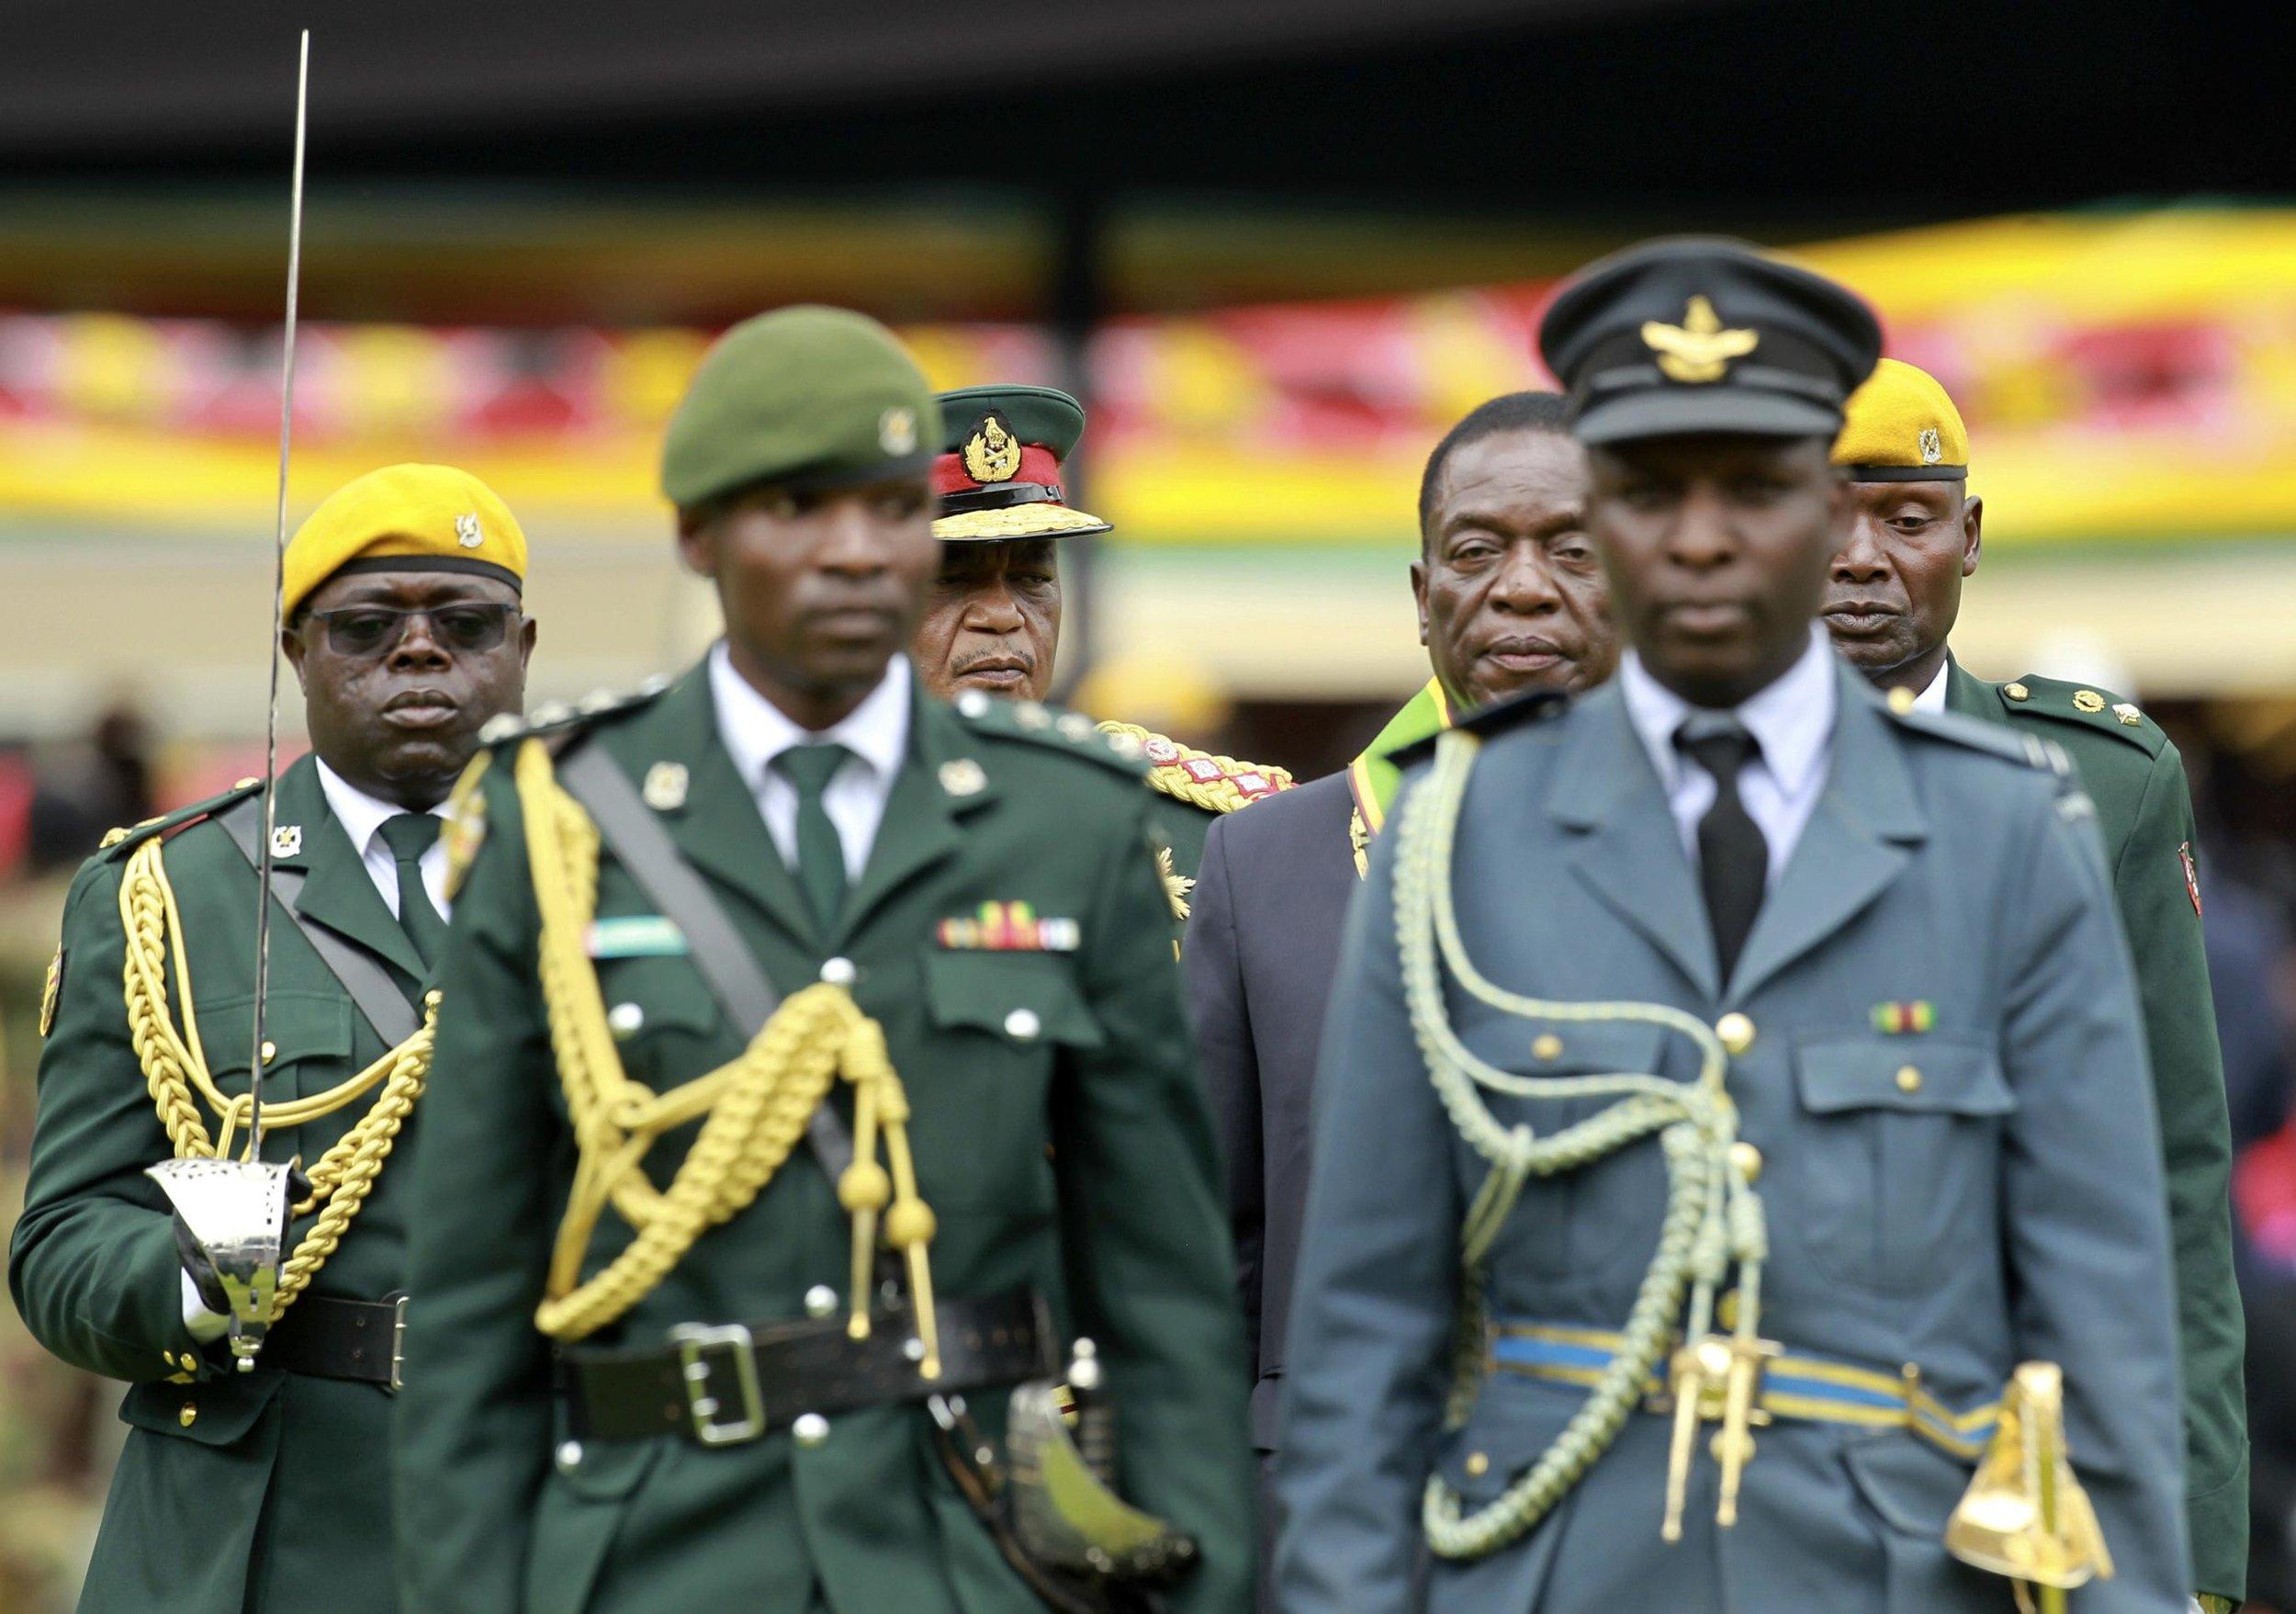 zimbabwe_new_president_79190.jpg